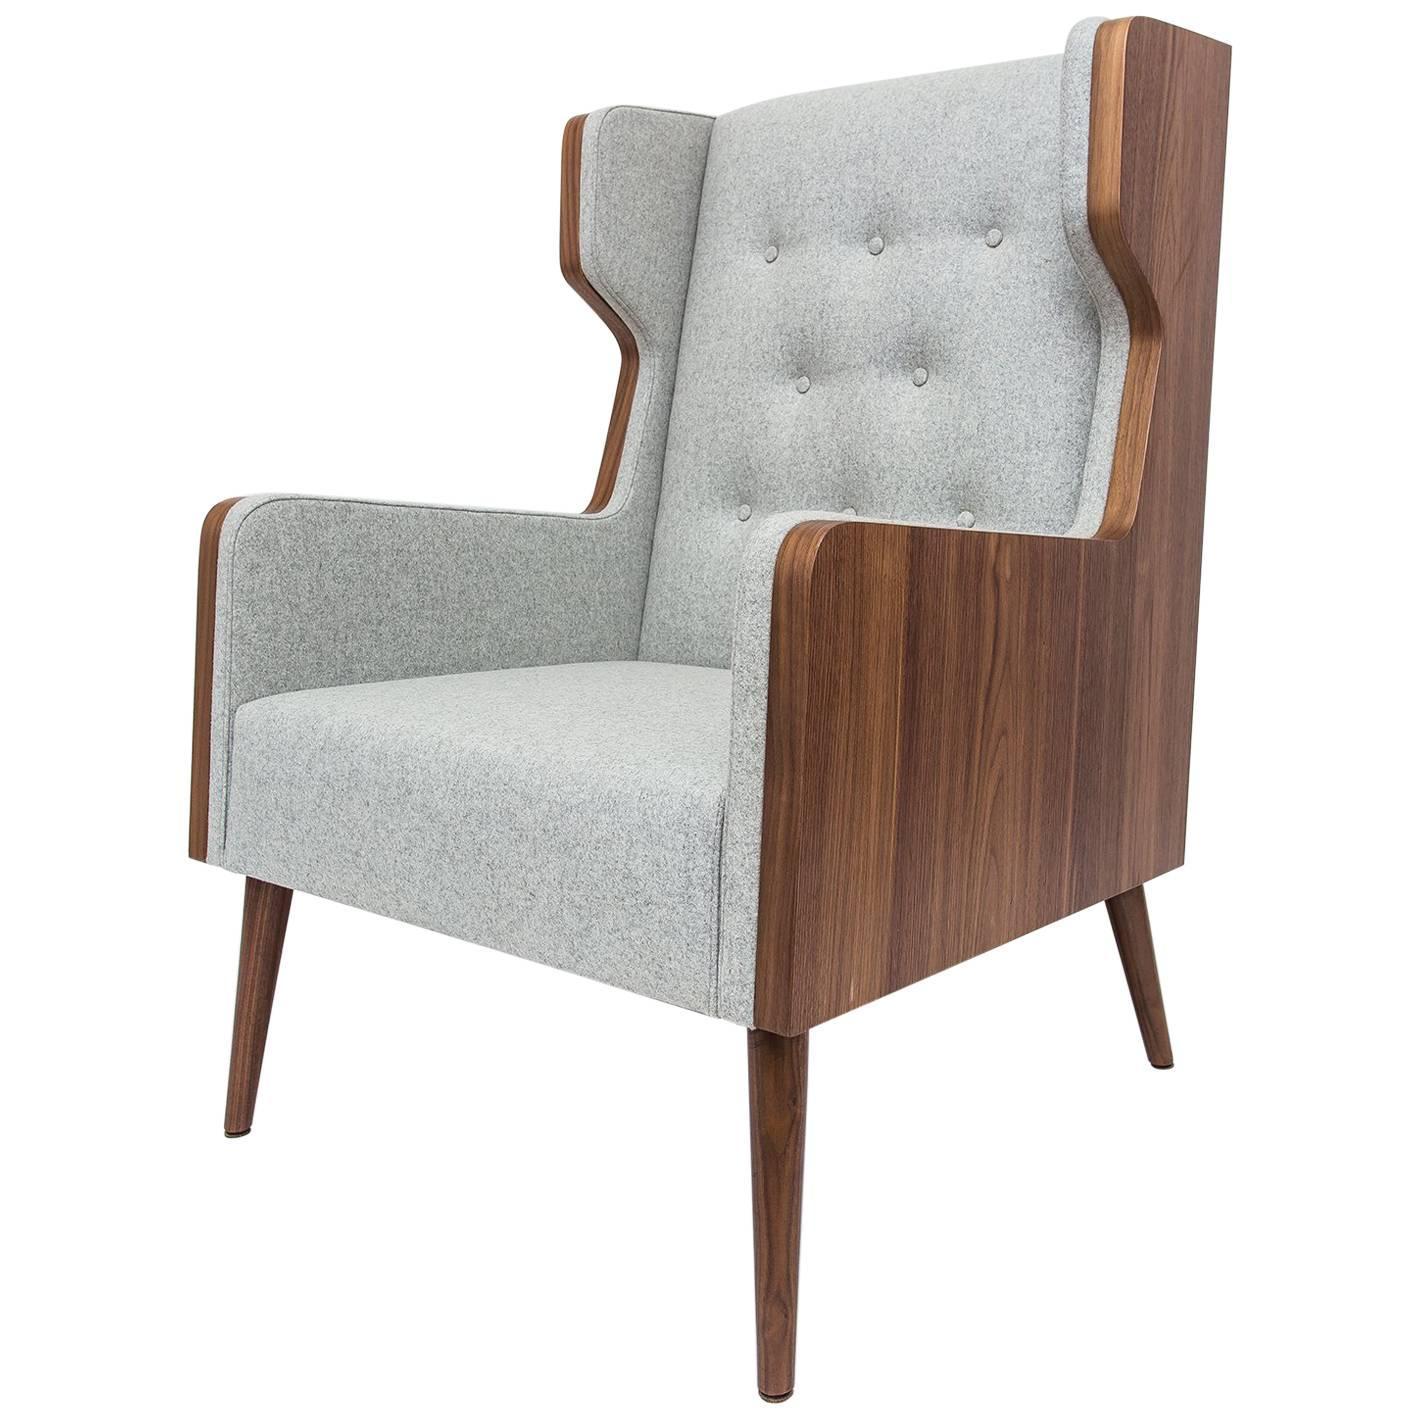 Contemporary American Walnut Felt Gray Armchair